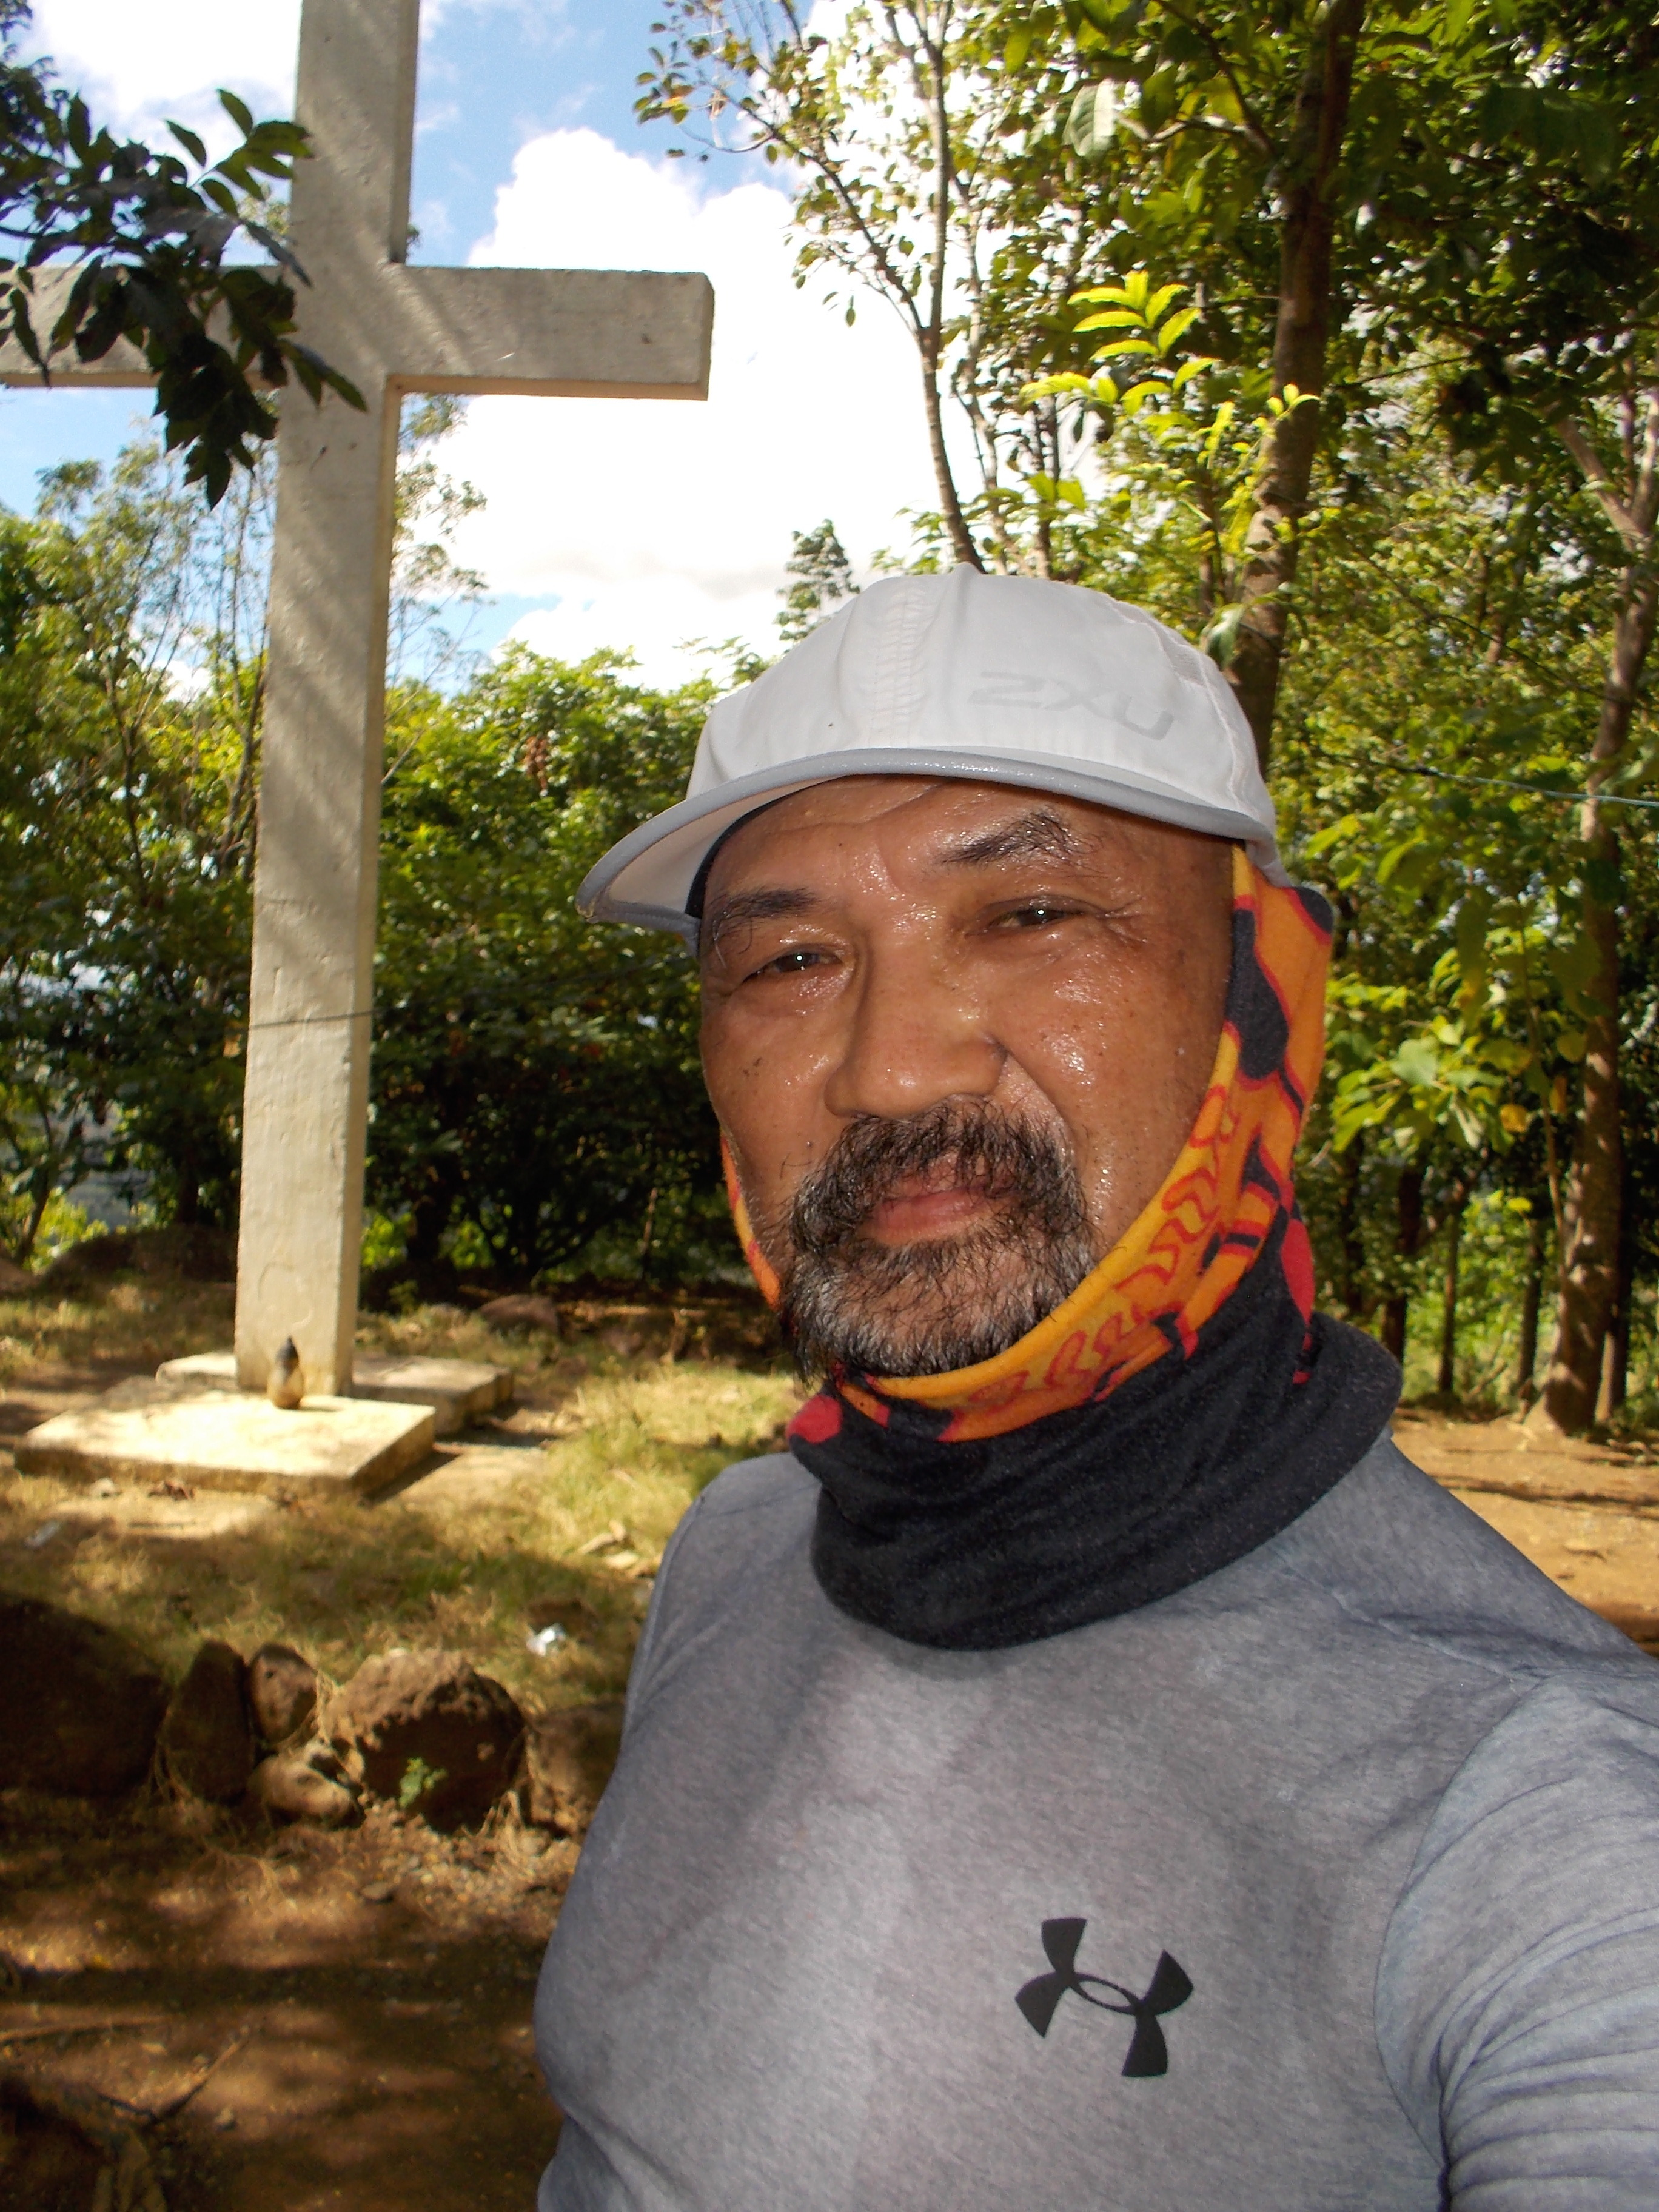 record fkt at taklang damulag bald runner